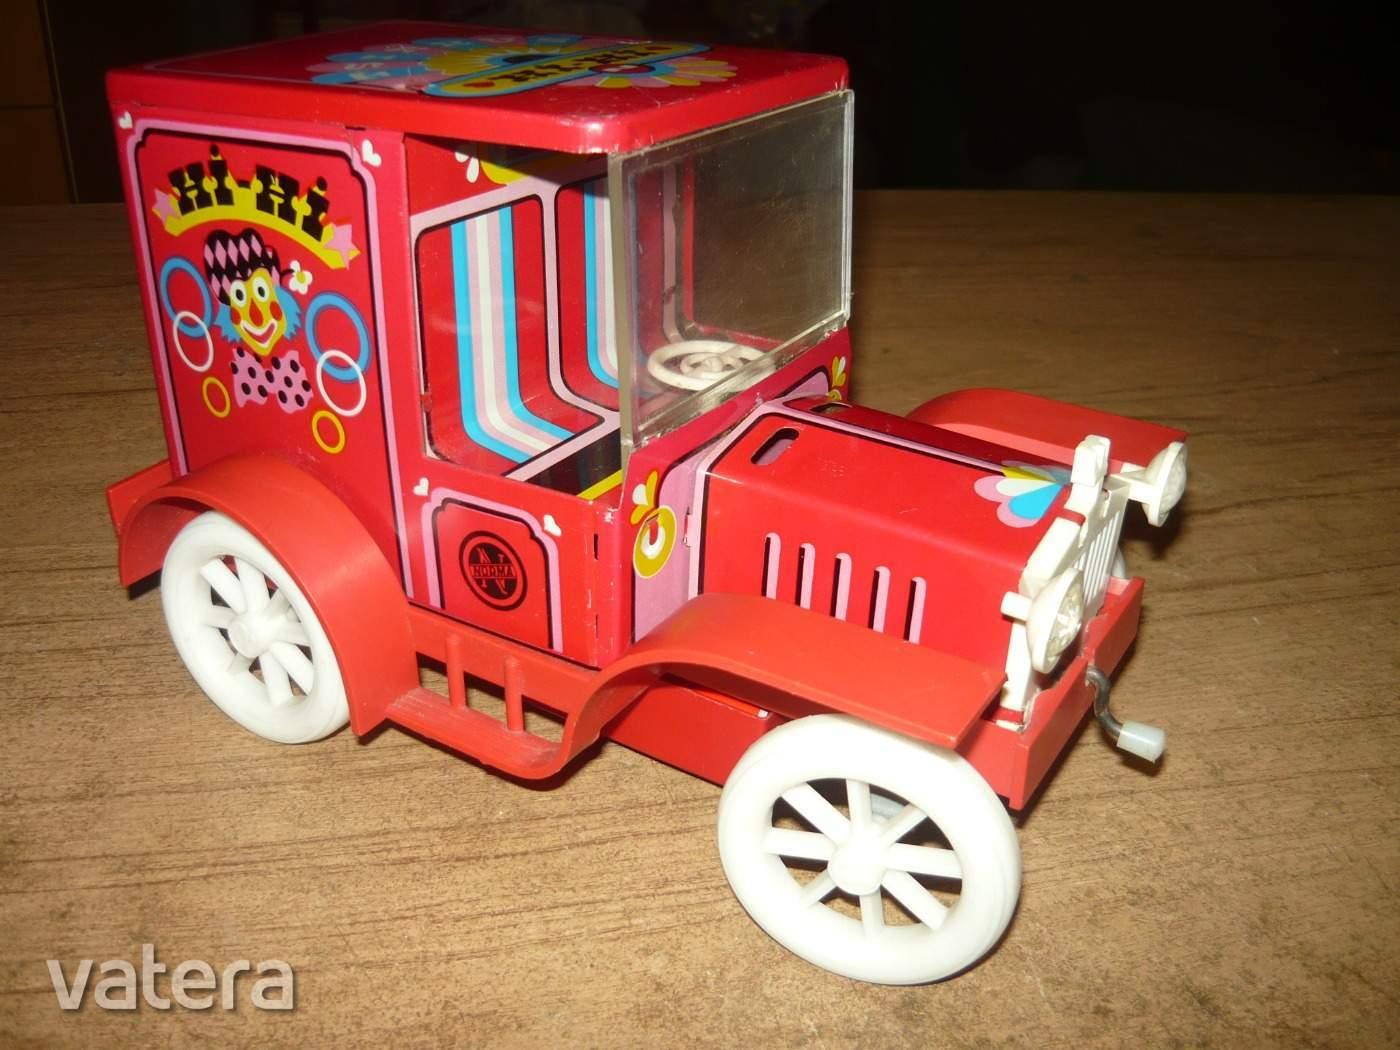 norma-hi-hi-cirkuszkocsi-cccp-lemezjatek-766b_1_big.jpg